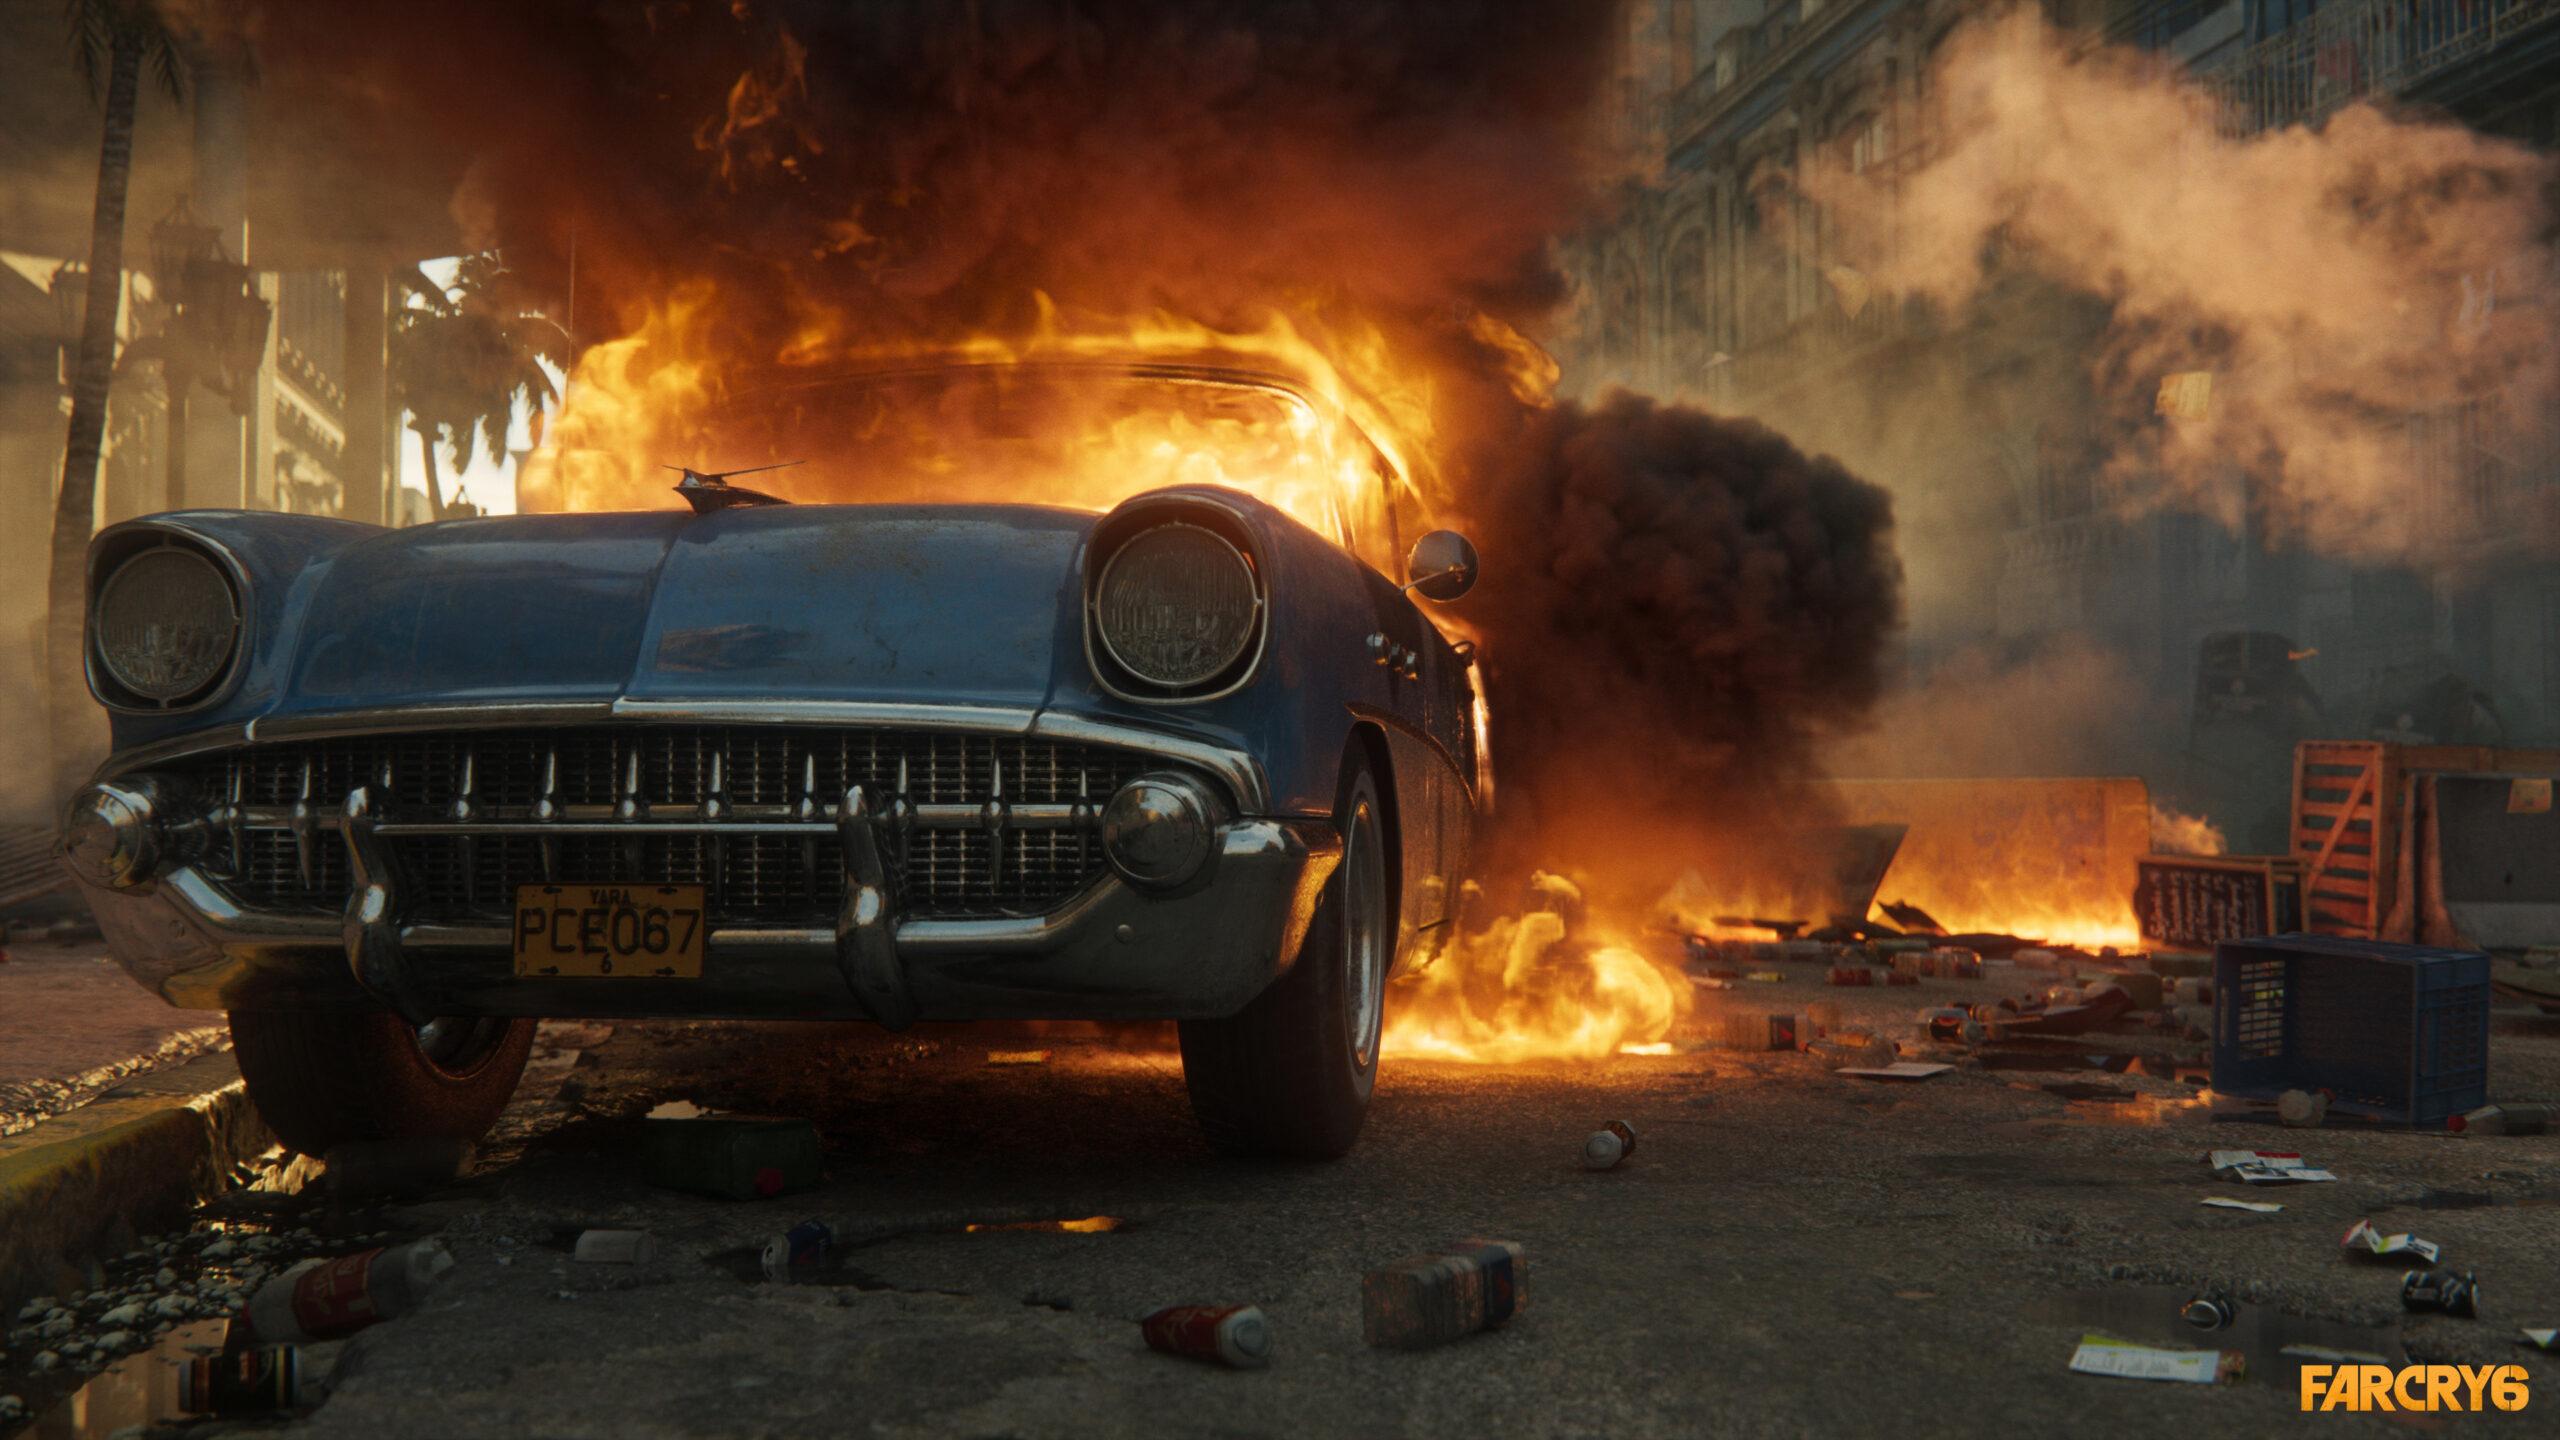 Far Cry 6 Burning Car Screenshot